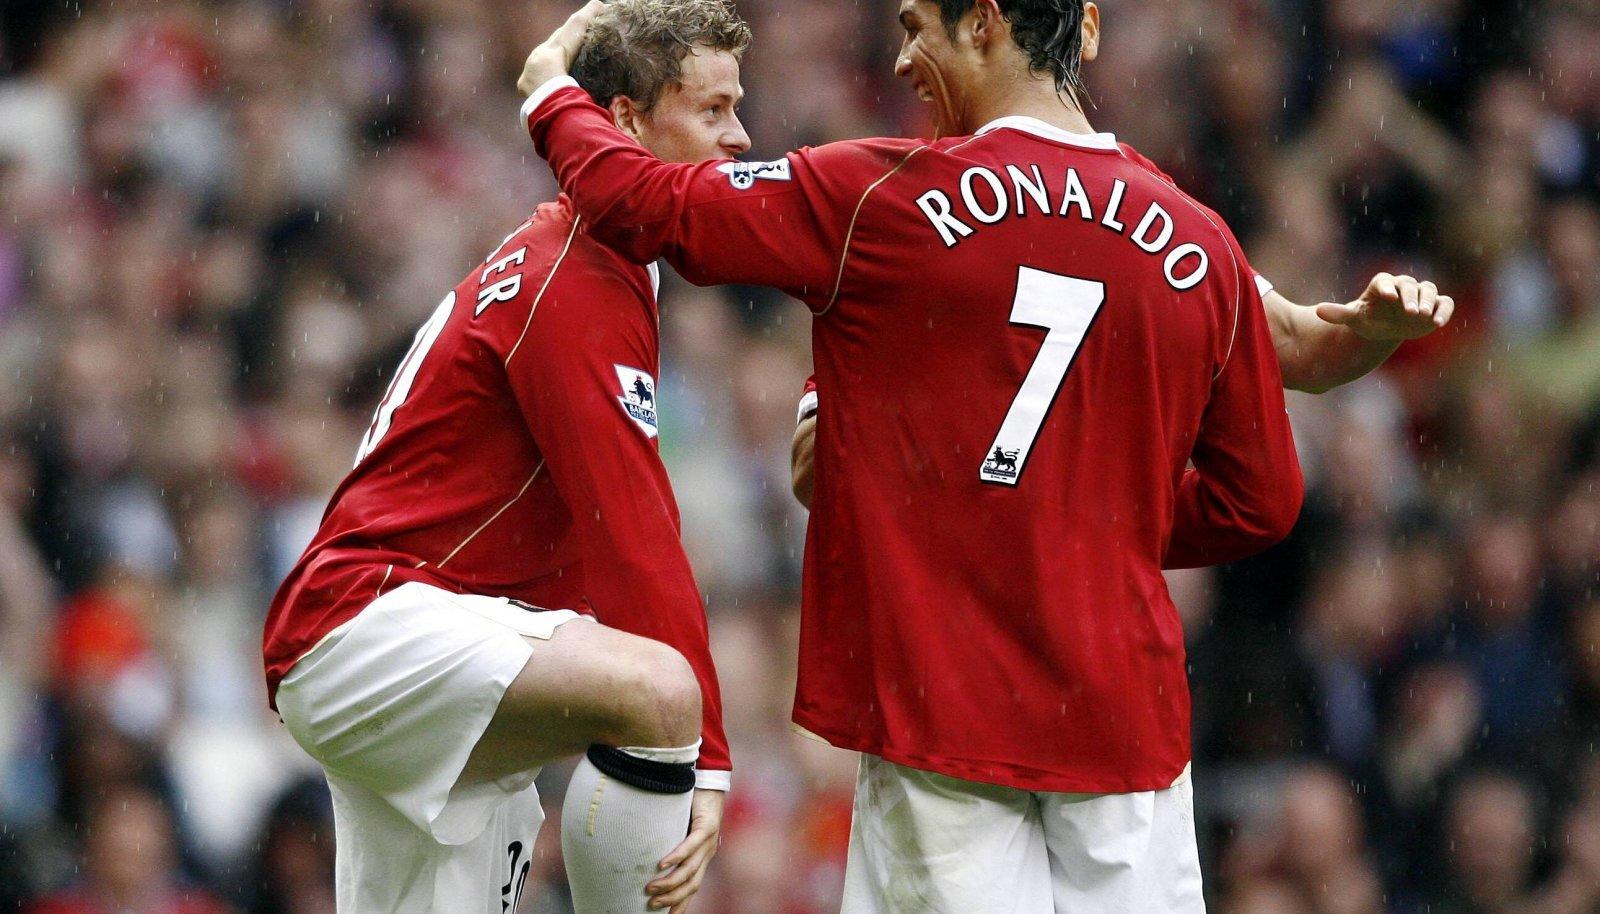 Unitedi praegune peatreener Ole Gunnar Solskjaer ja Cristiano Ronaldo aastal 2006.